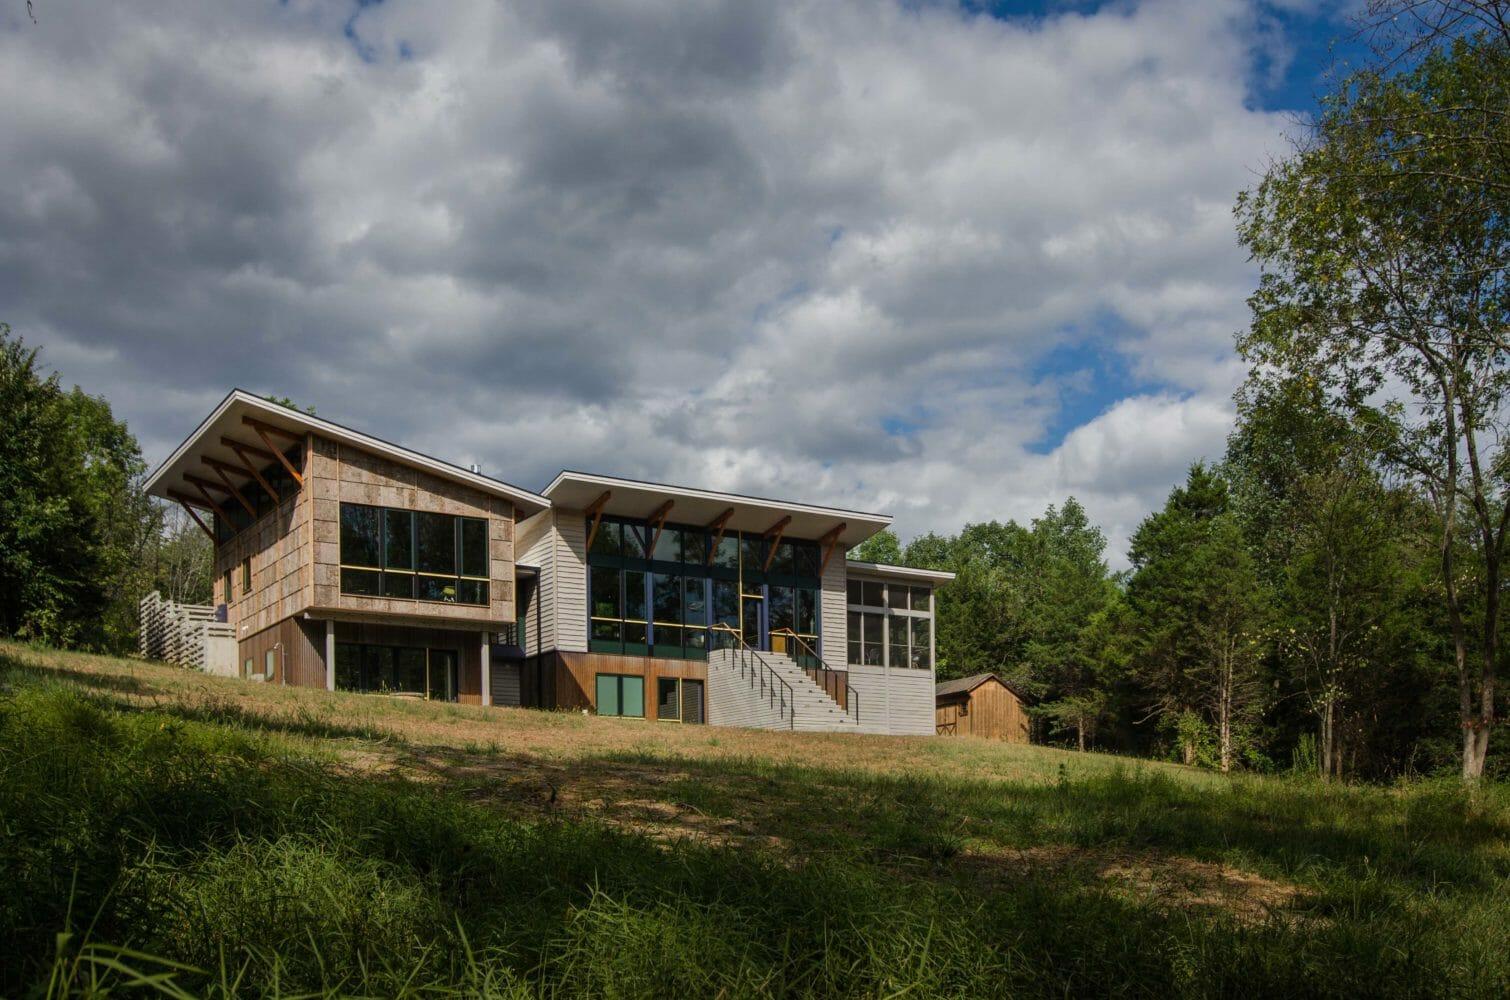 bark-house-exterior-poplar-bark-siding-Camusrory-02